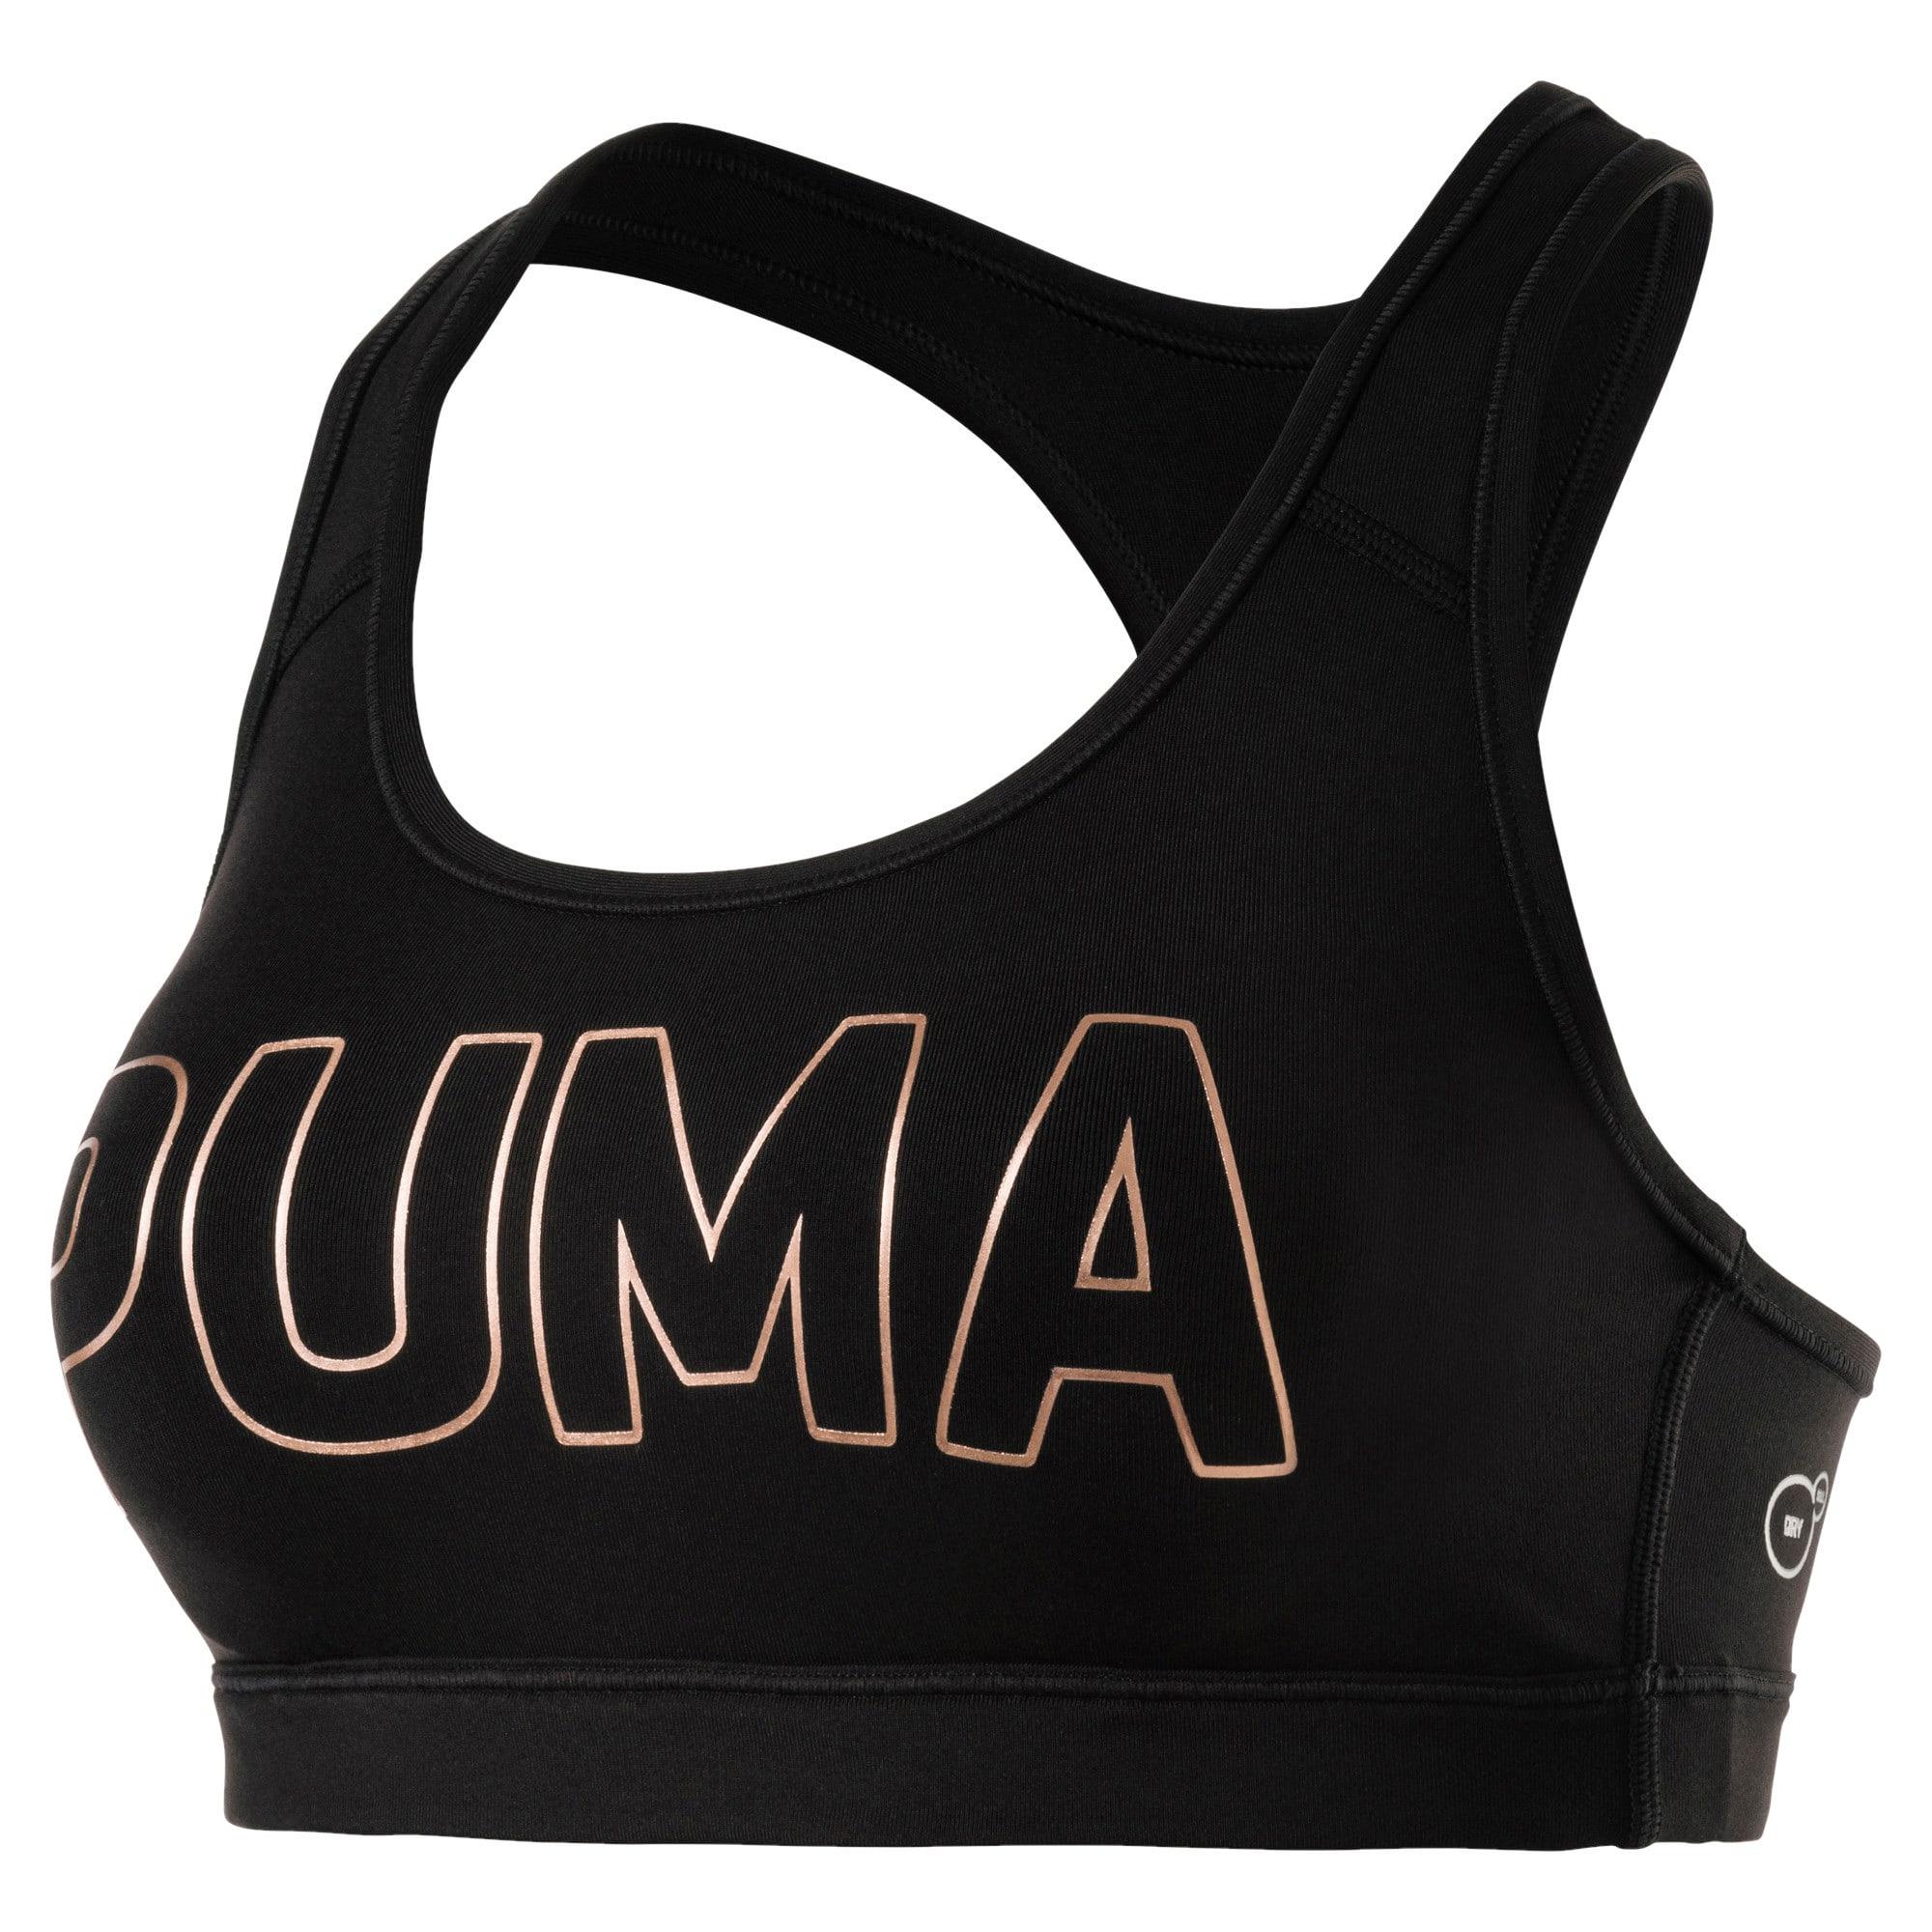 Thumbnail 1 of Training Women's PWRSHAPE Forever Padded Logo Bra Top, Puma Black-PUMA, medium-IND